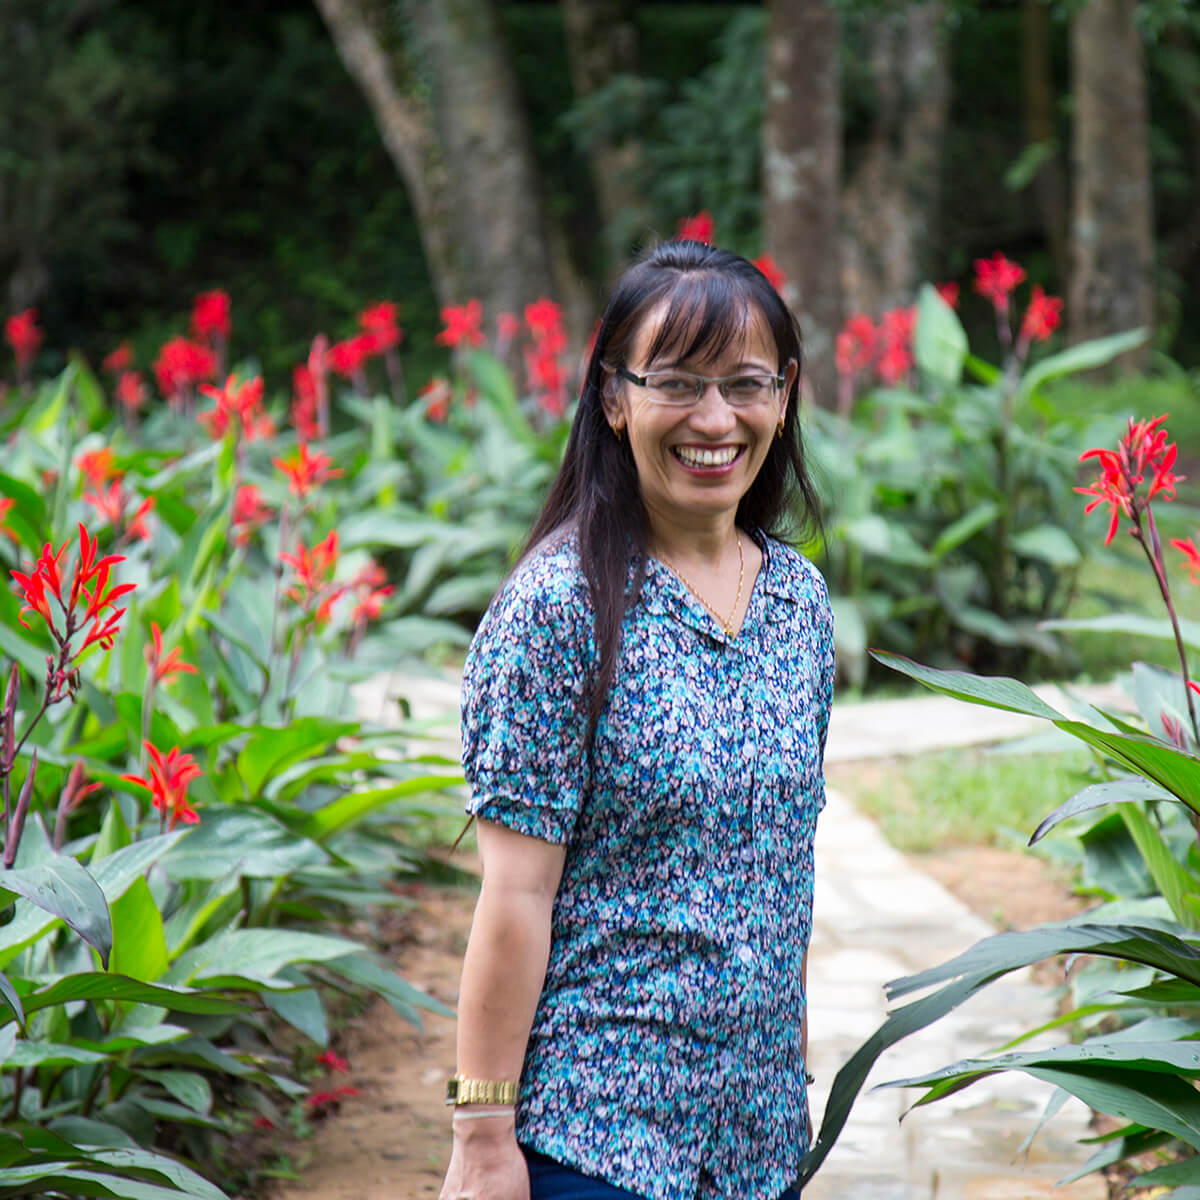 Abha Awale during the botanical gardens visit.